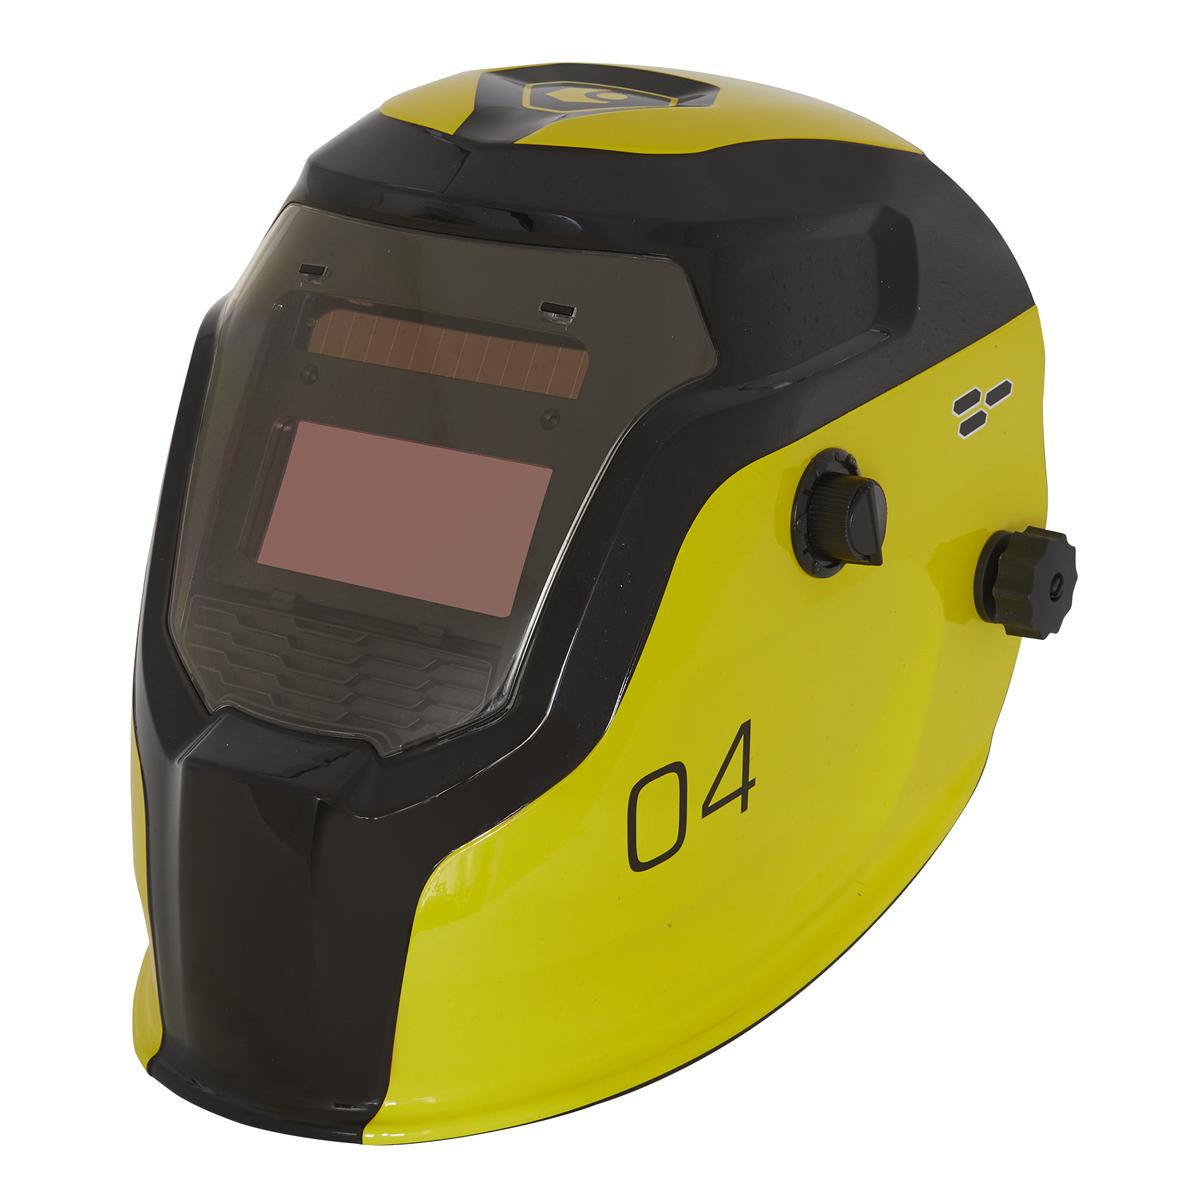 Auto Darkening Welding Helmet Shade 9-13 - Yellow